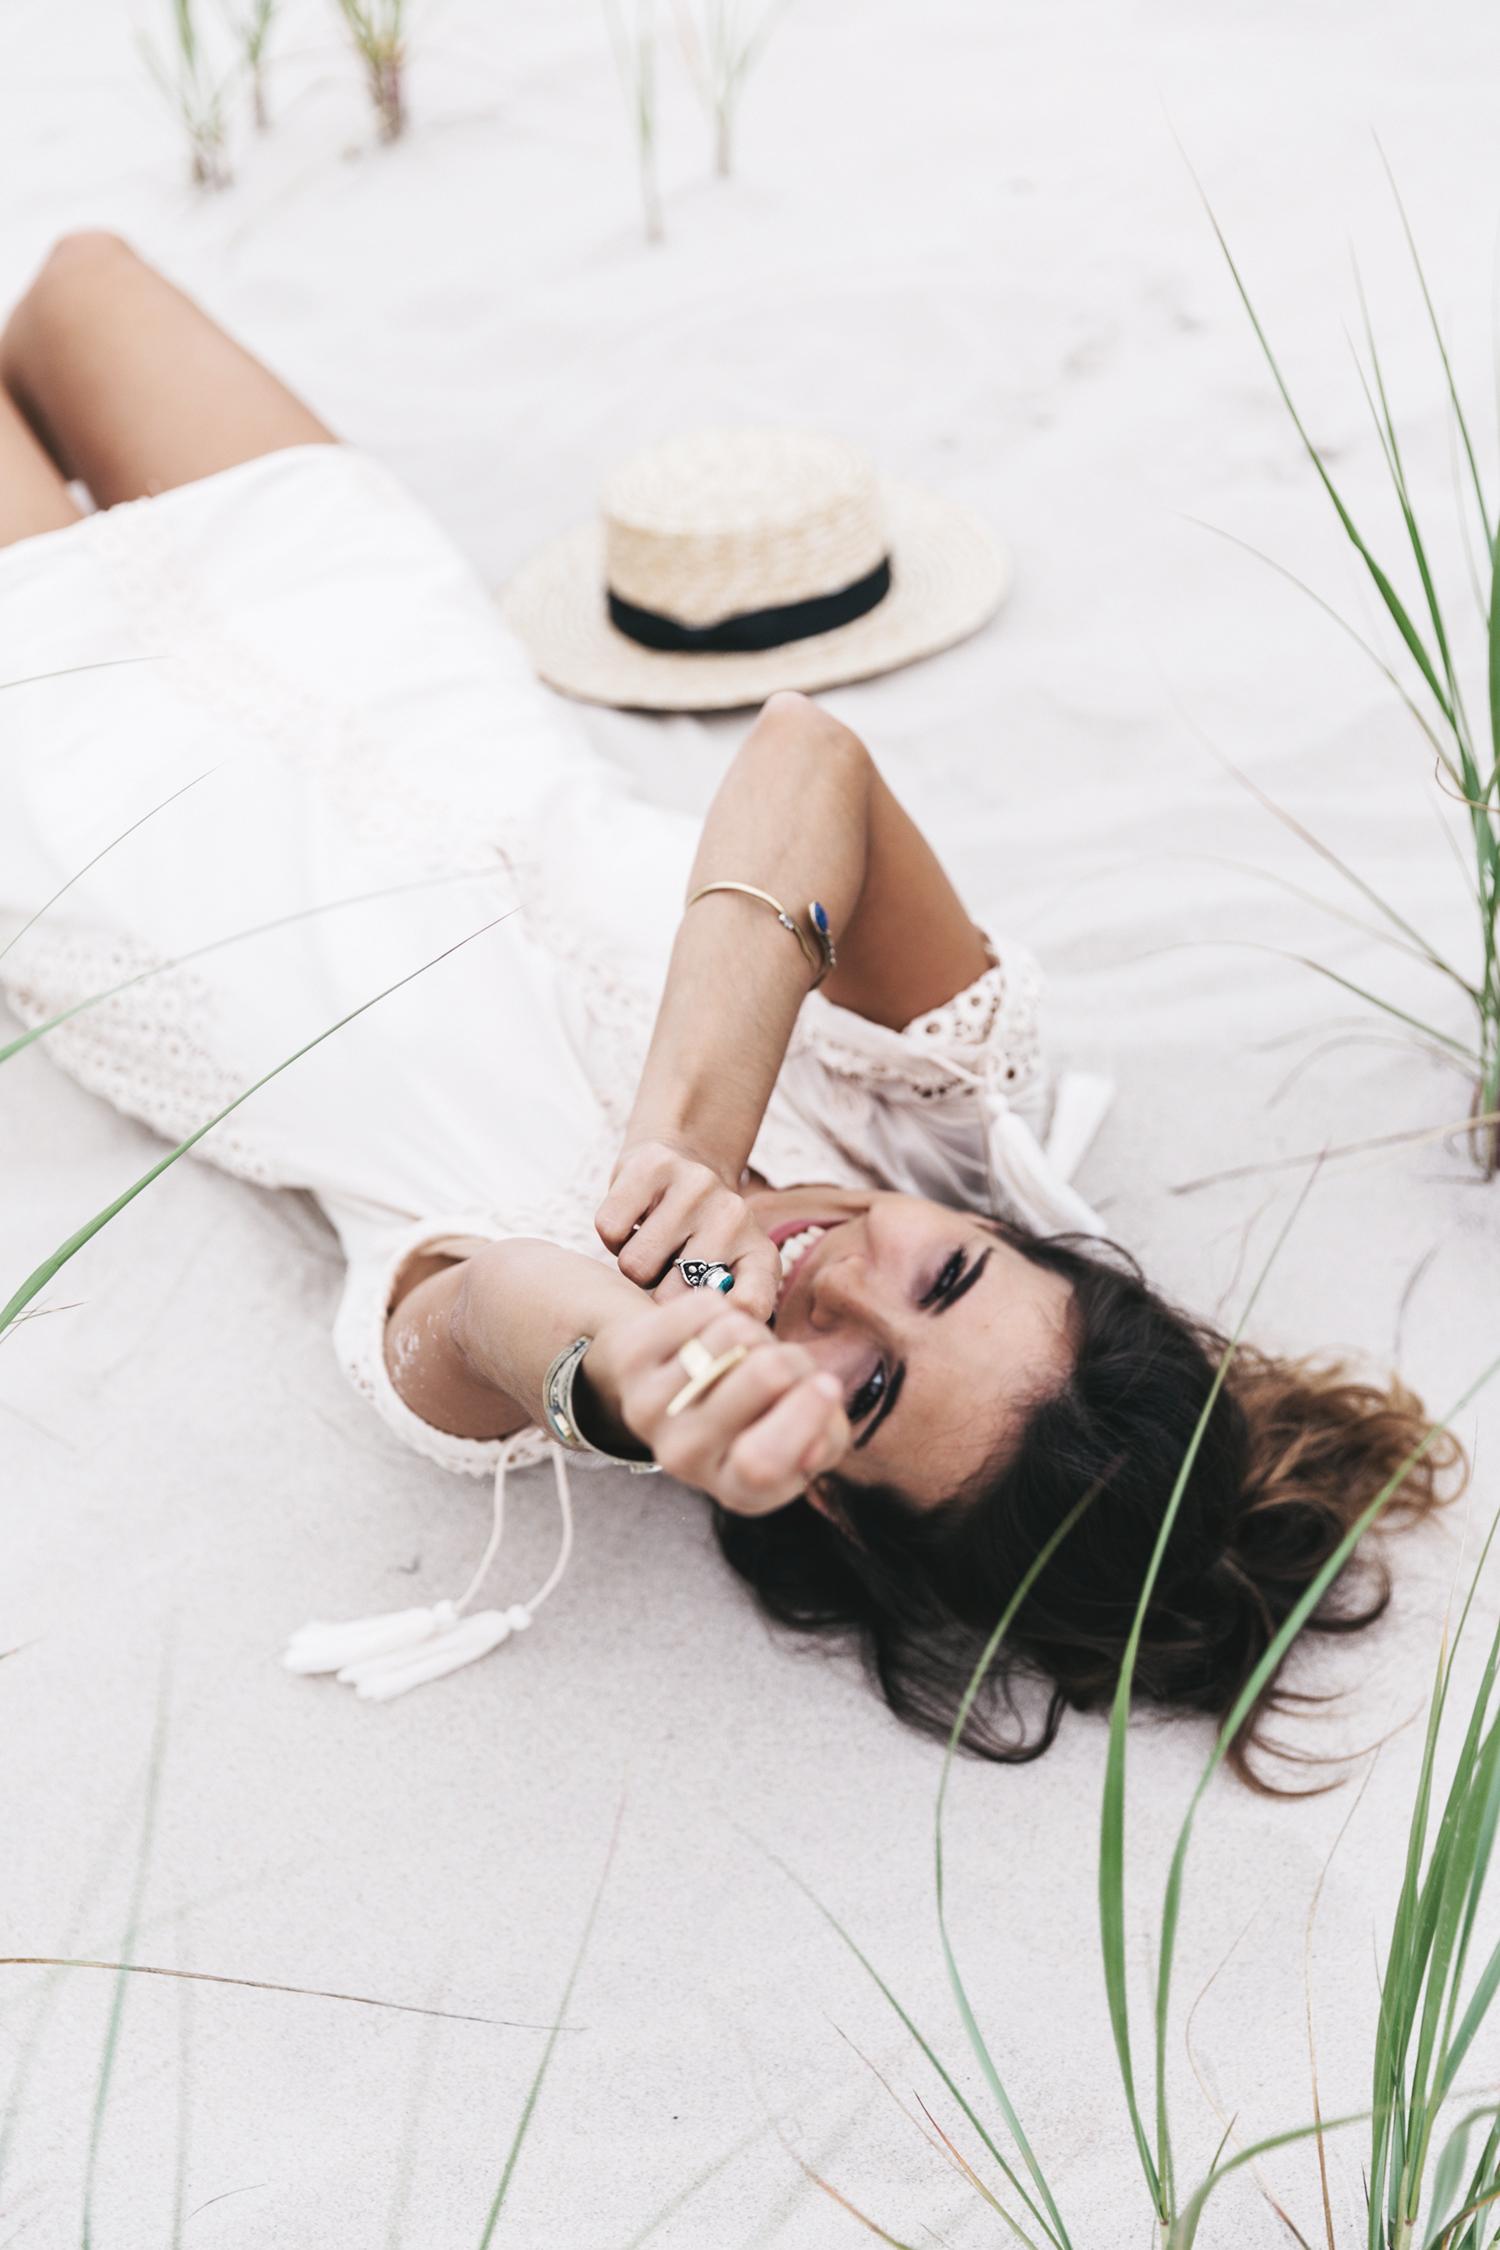 Revolve_in_The_Hamptons-Revolve_Clothing-Collage_Vintage-Cream_Dress-Tularosa-Canotier-55